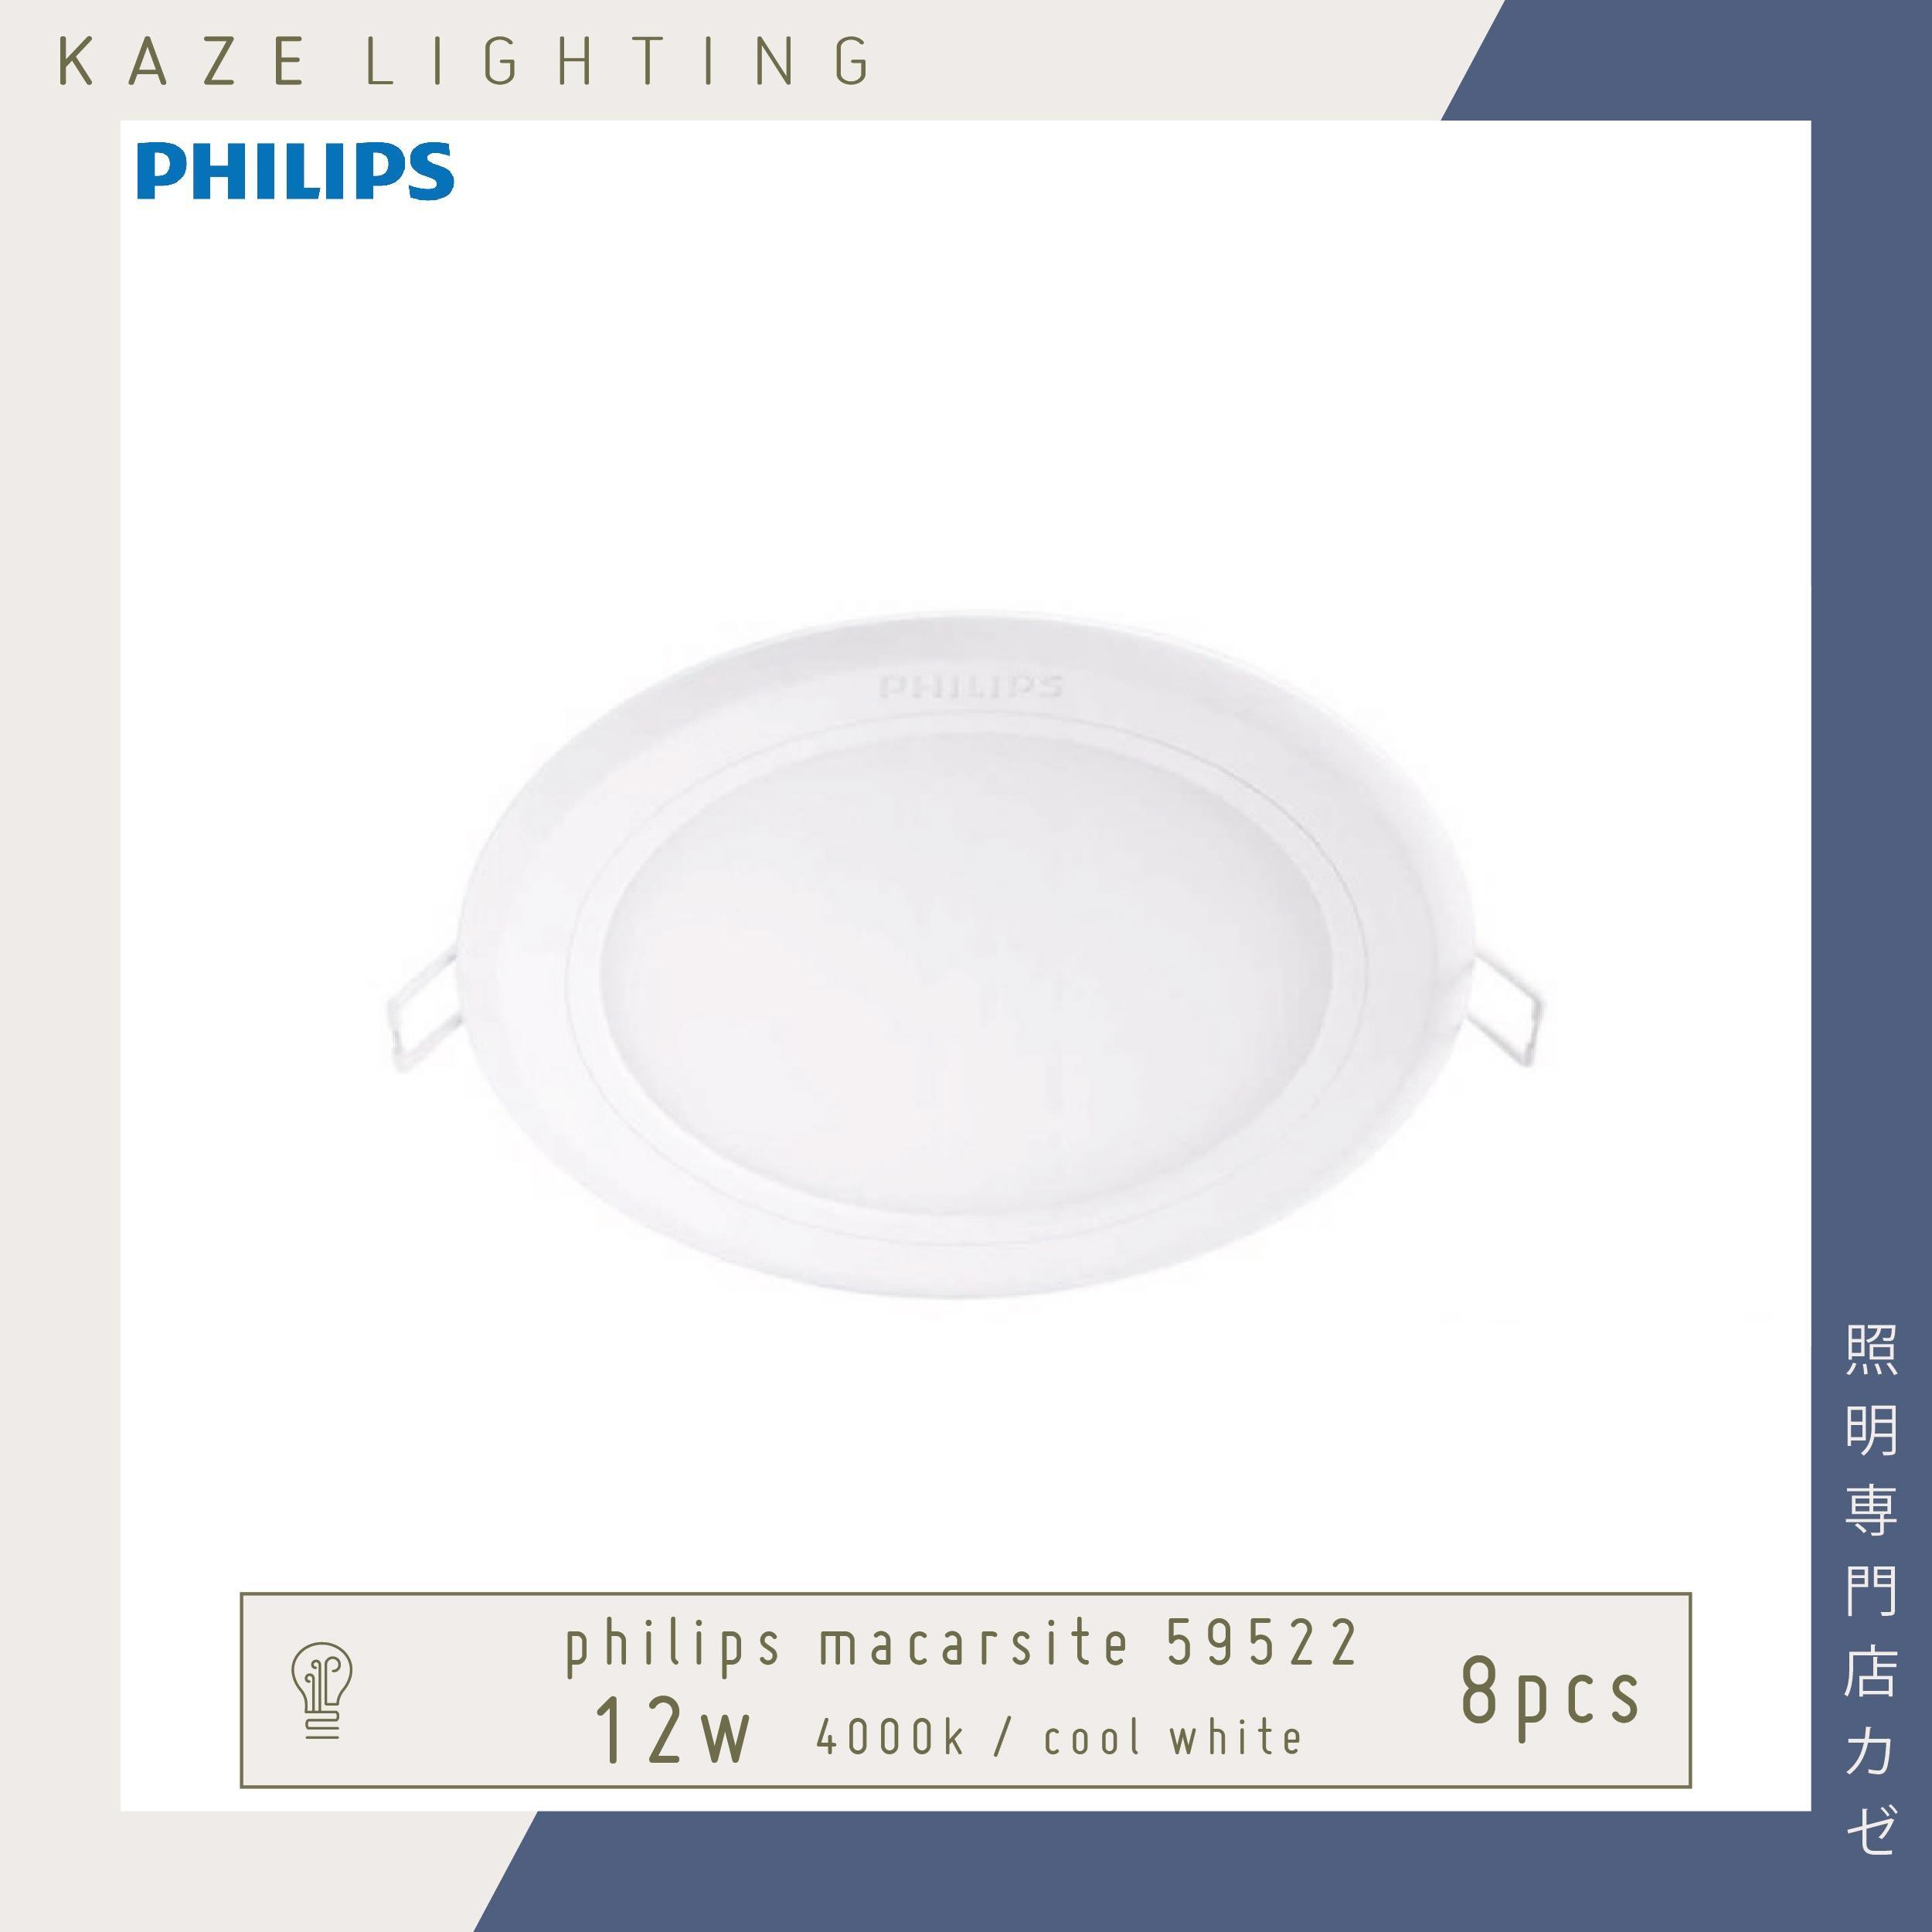 8Pcs Philips Marcasite 59522 Downlight Round 12w 4000k